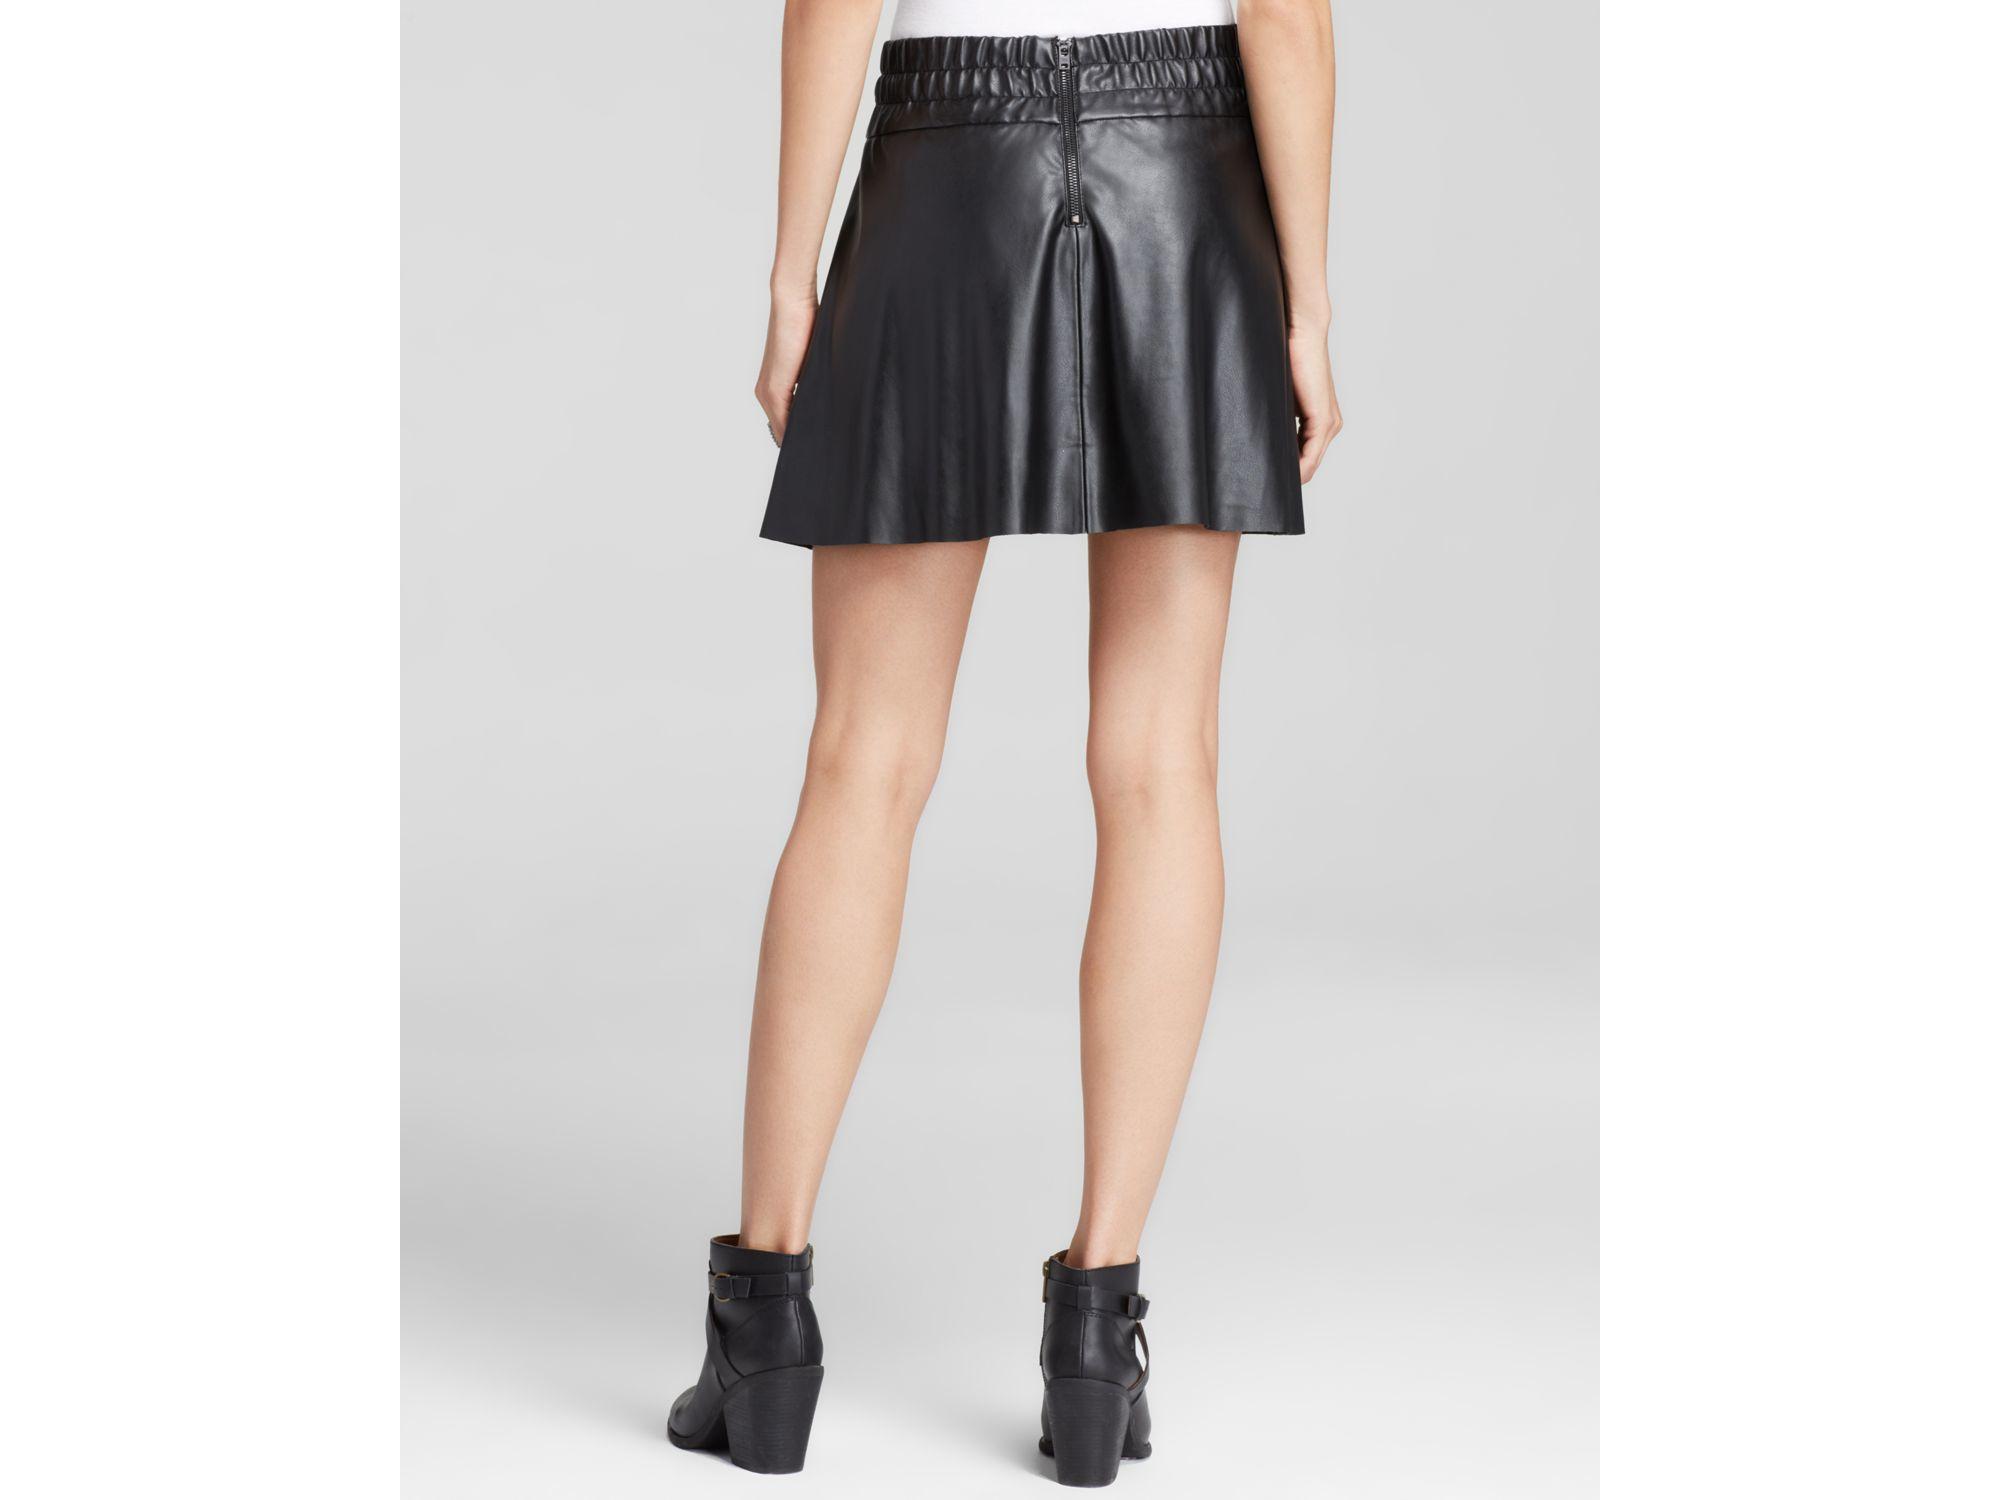 pam gela skirt faux leather high waist skater in black